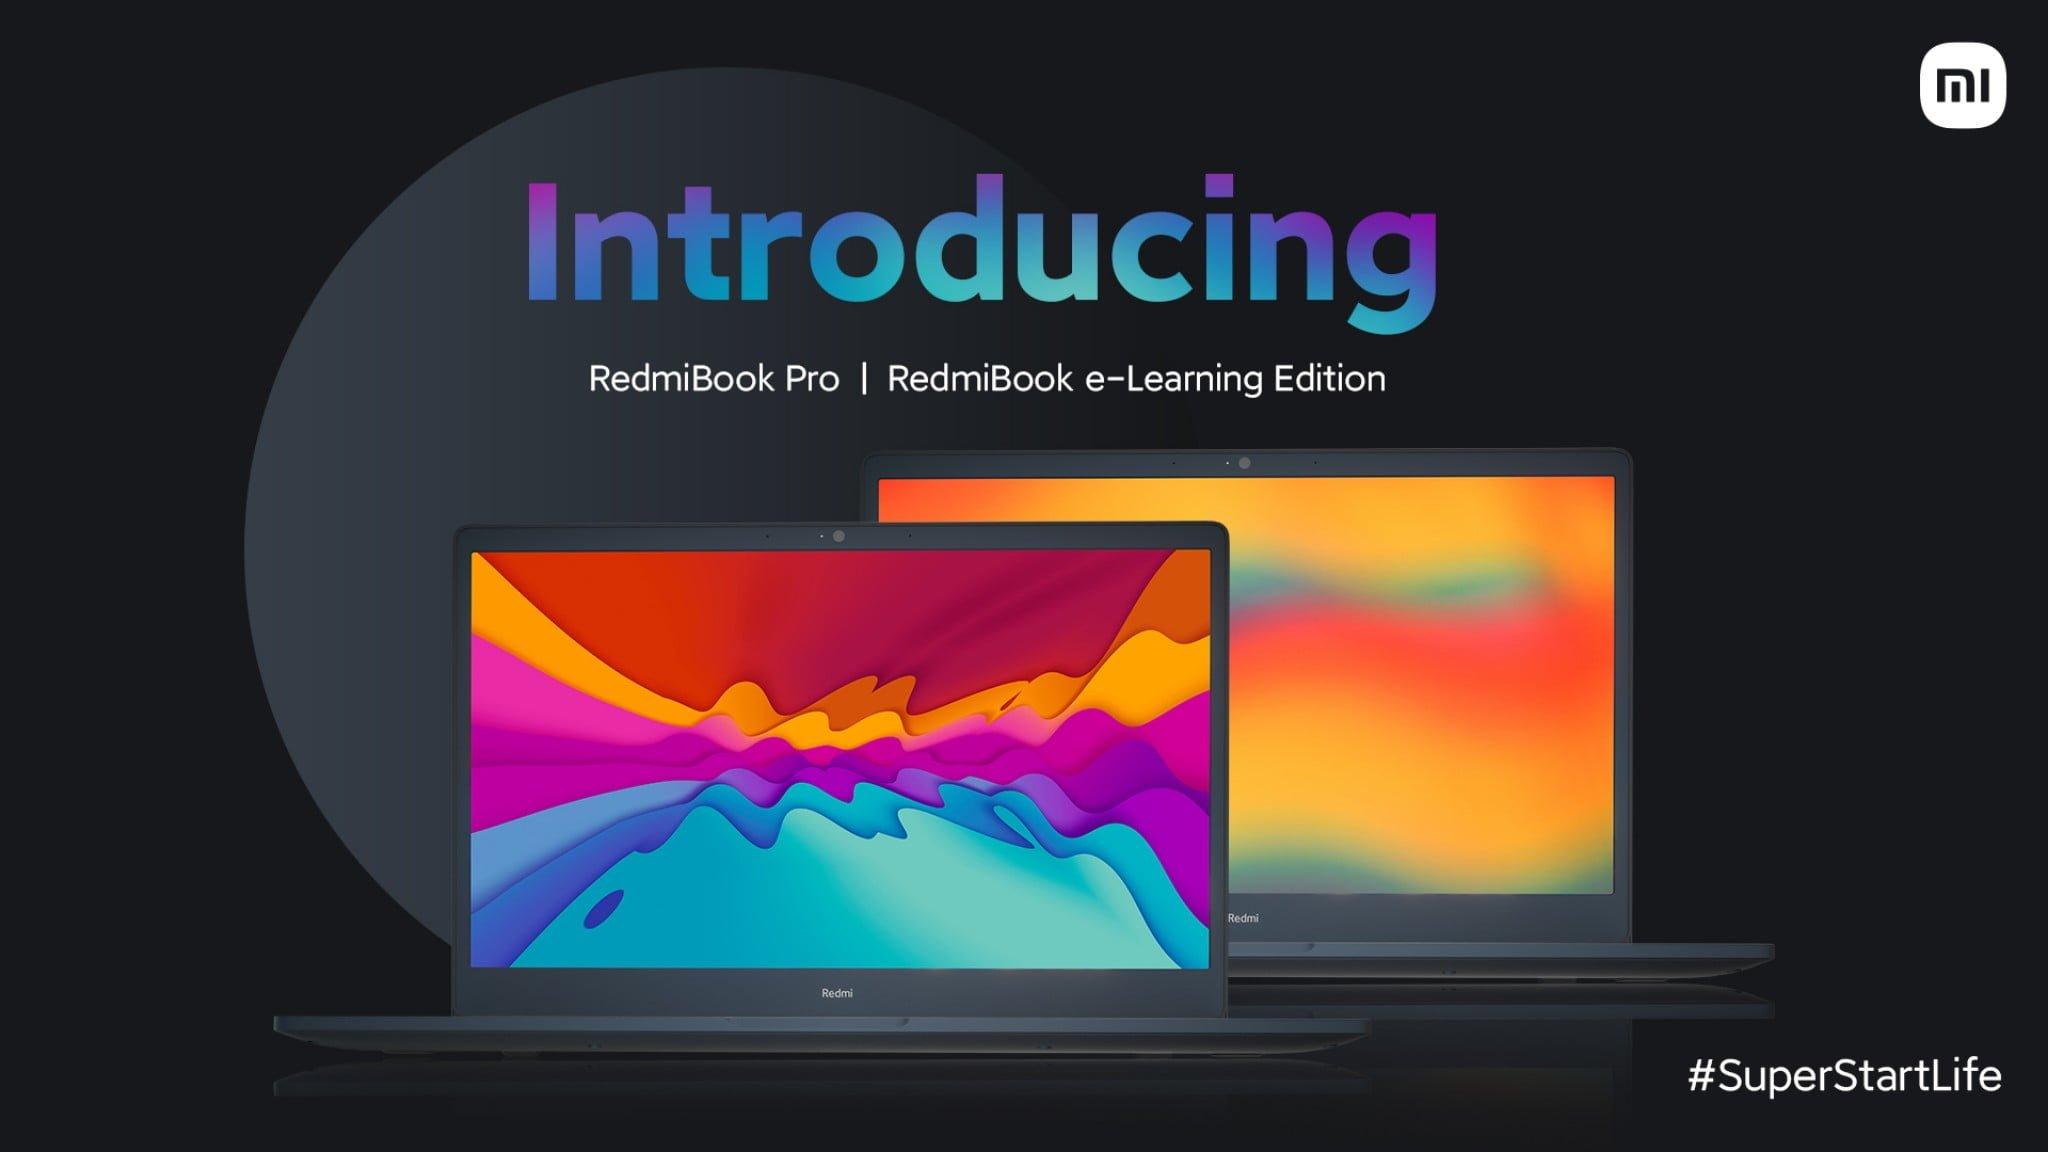 RedmiBook Pro E Learning